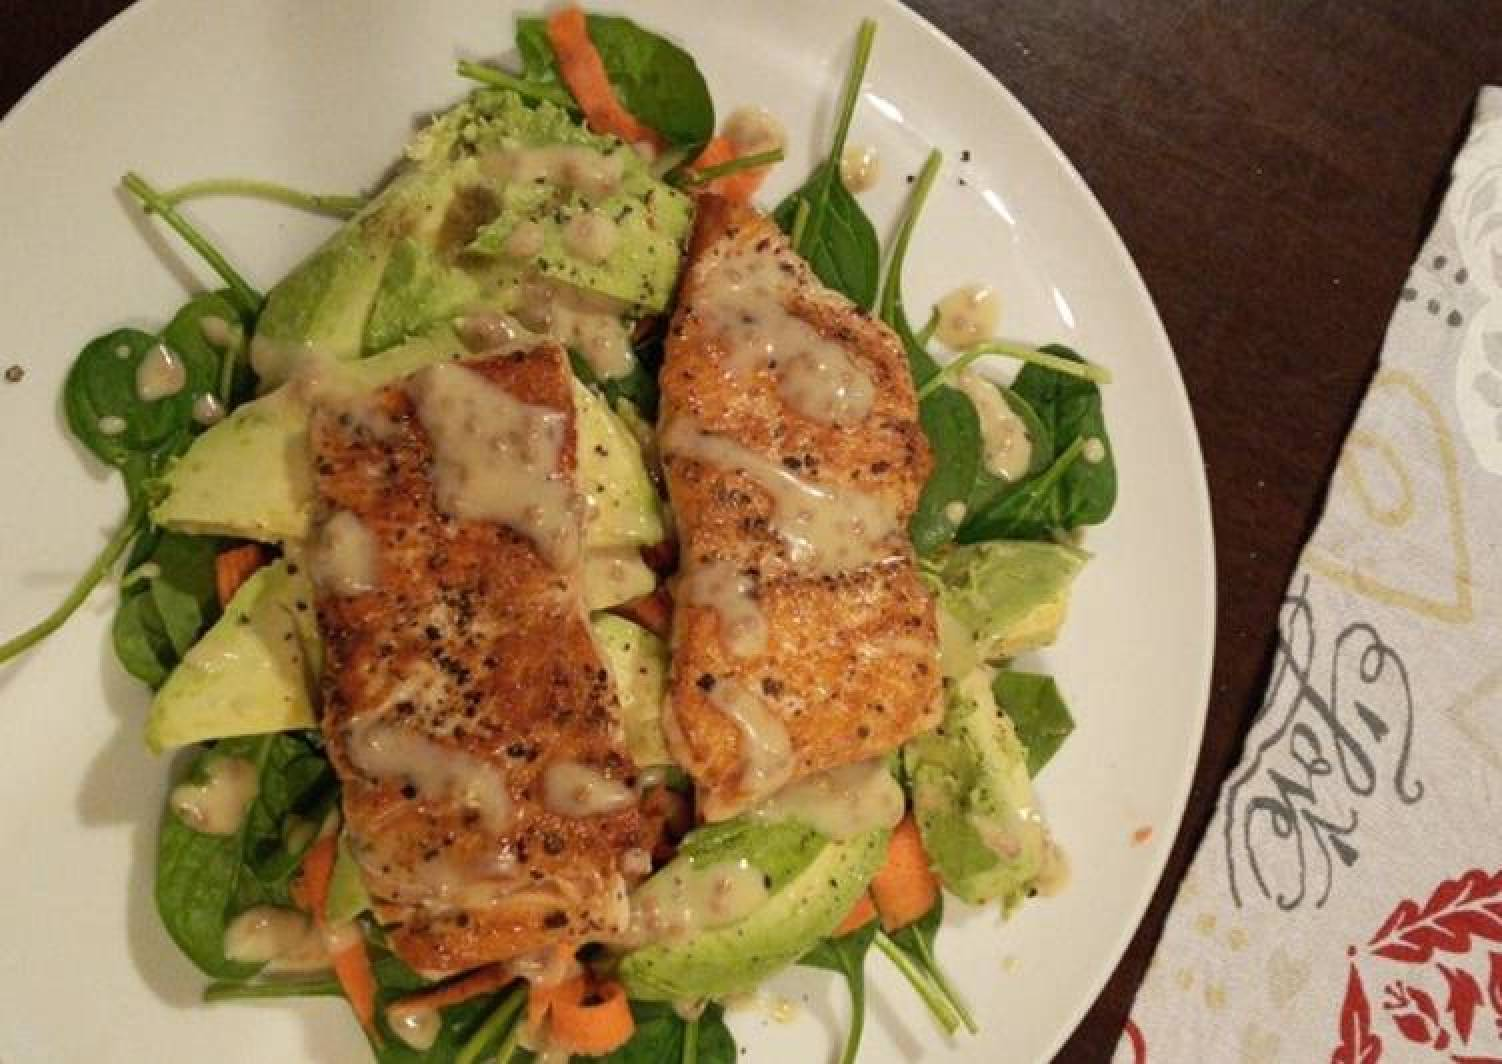 Pan fried salmon and avocado salad